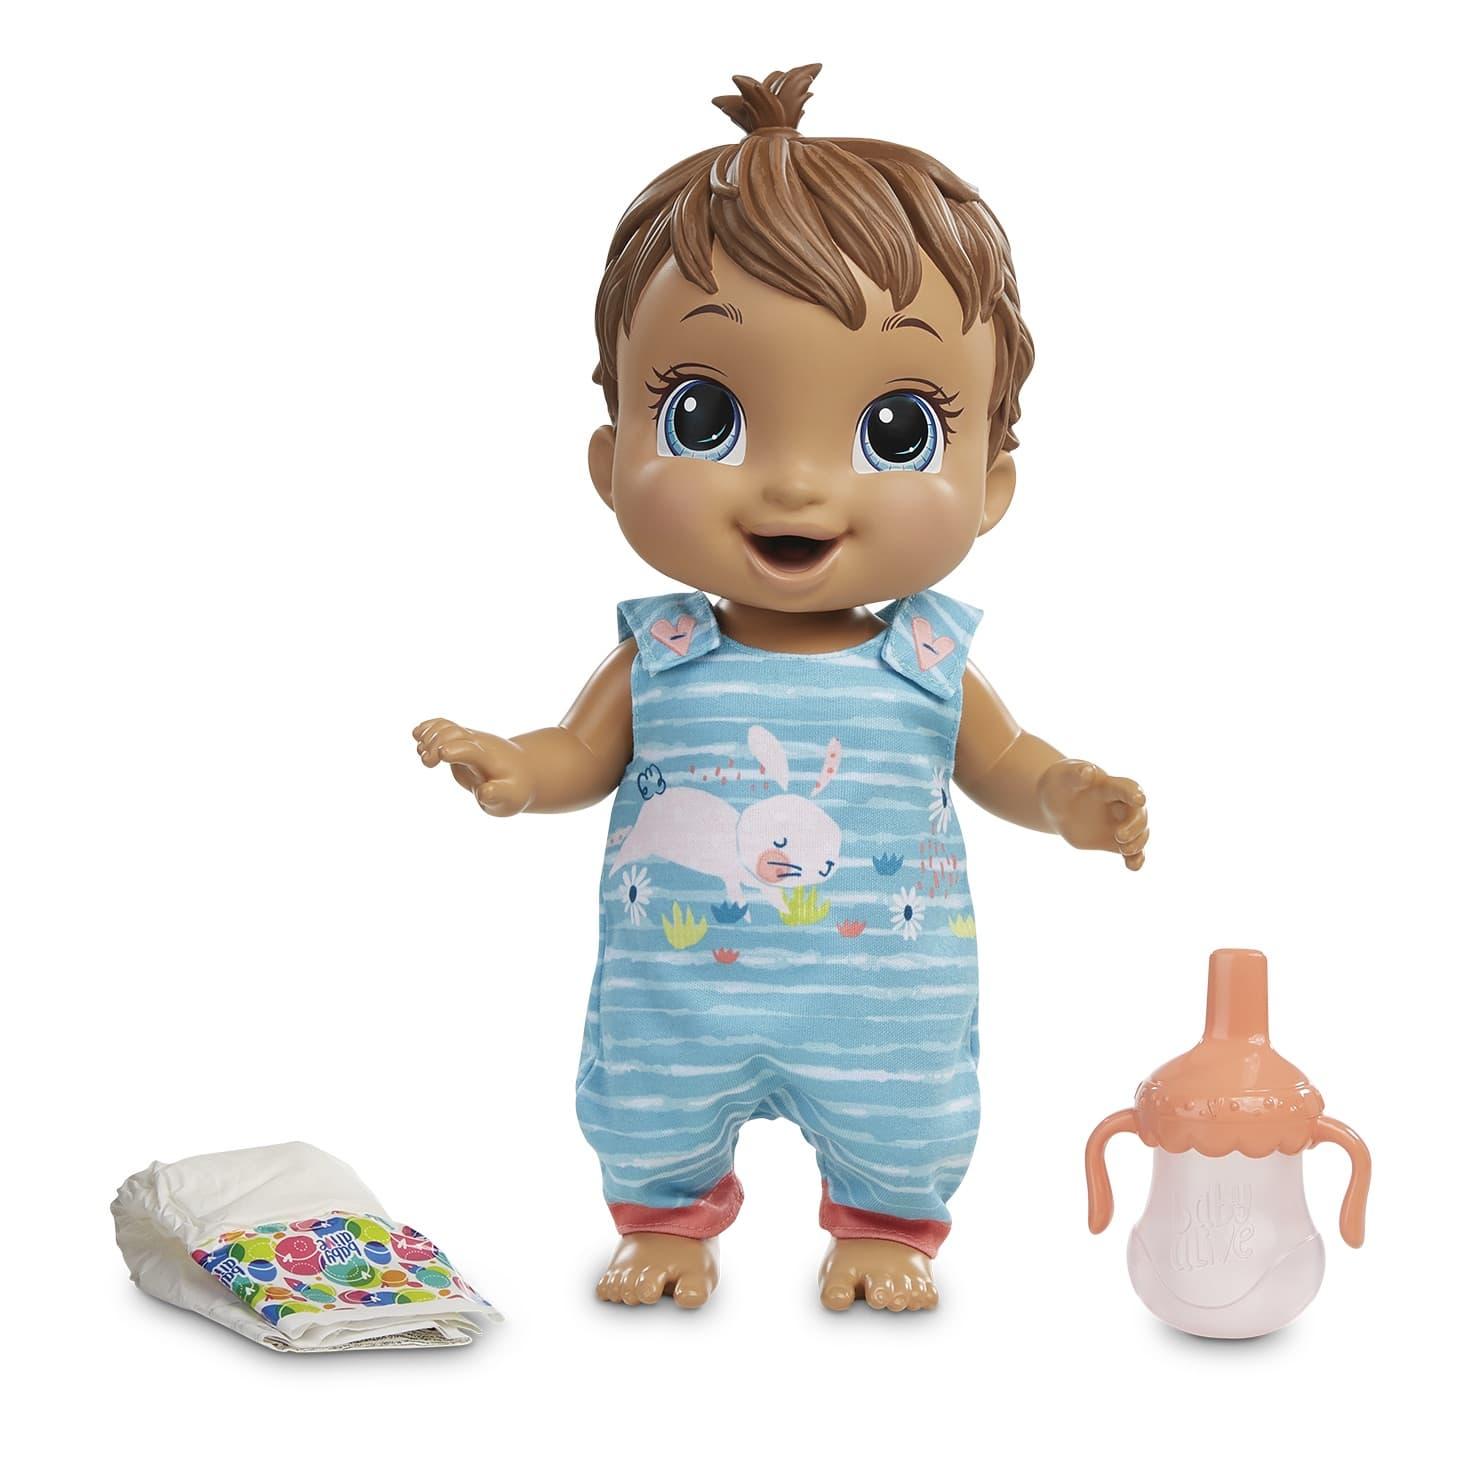 E9426 BABY ALIVE BABY GOTTA BOUNCE 2